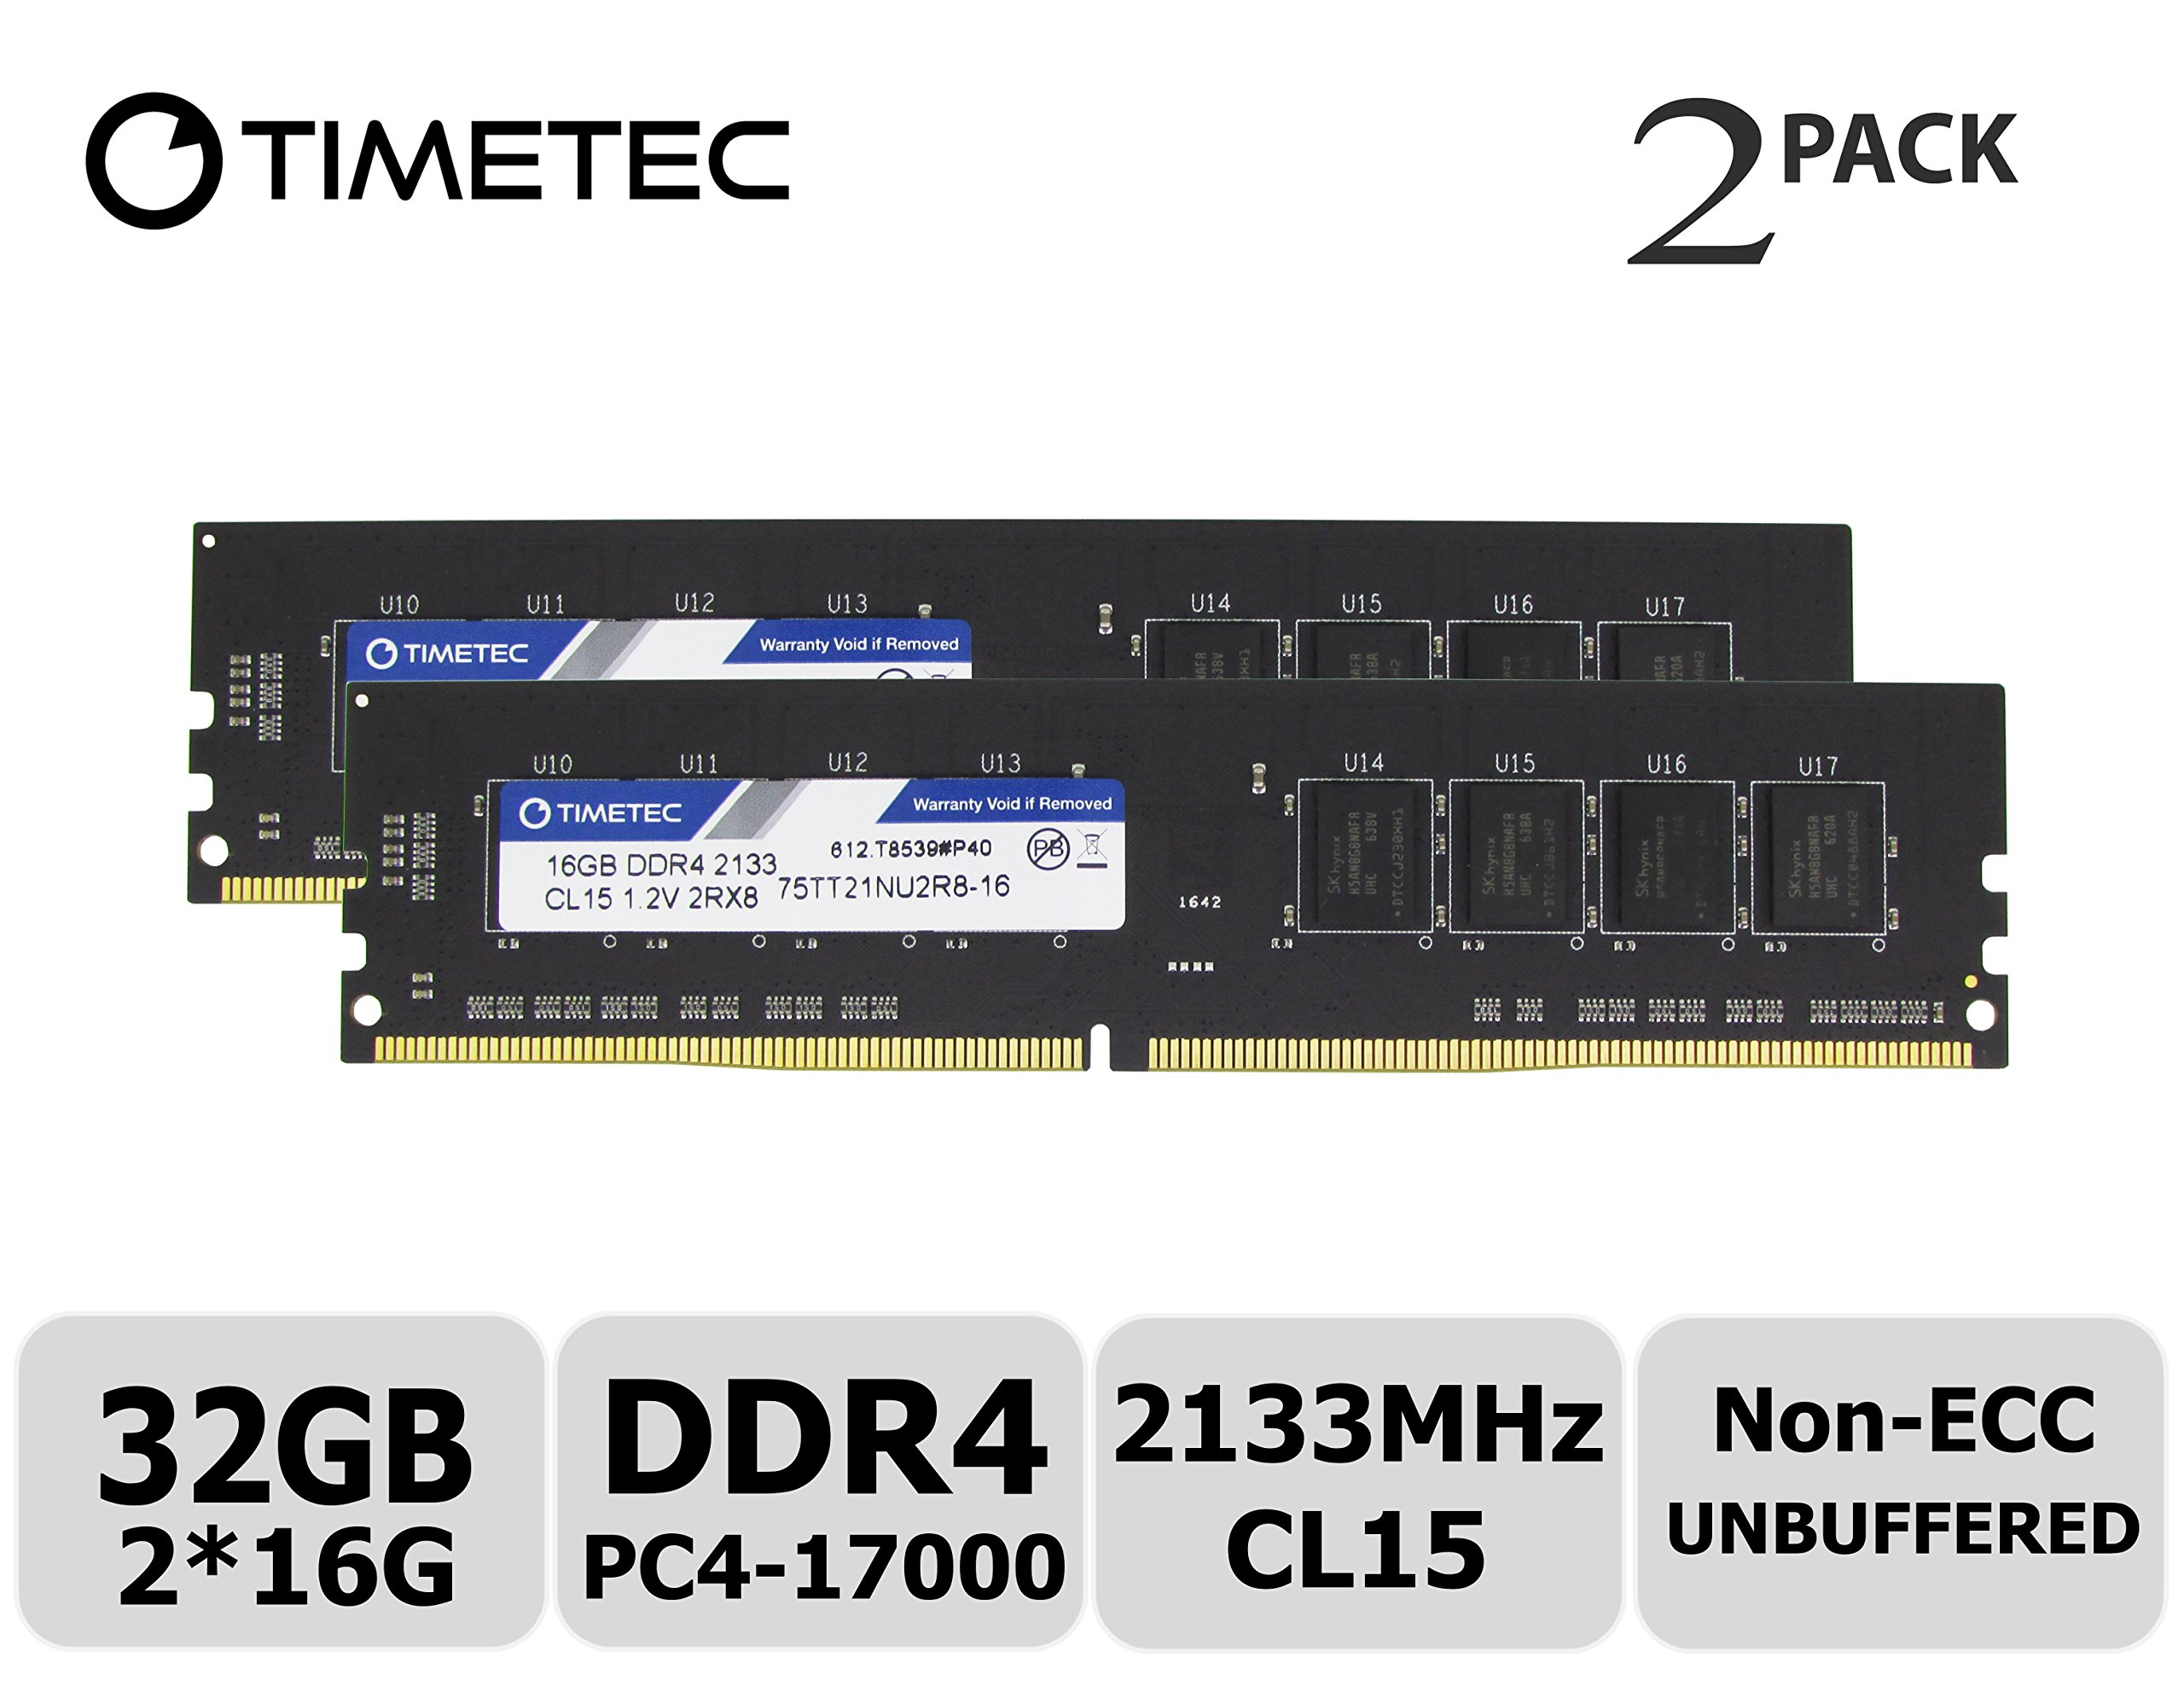 Memoria RAM 32GB Timetec Hynix IC KIT(2x16GB) DDR4 2133MHz PC4-17000 Non ECC Unbuffered 1.2V CL15 2Rx8 Dual Rank 288 Pin